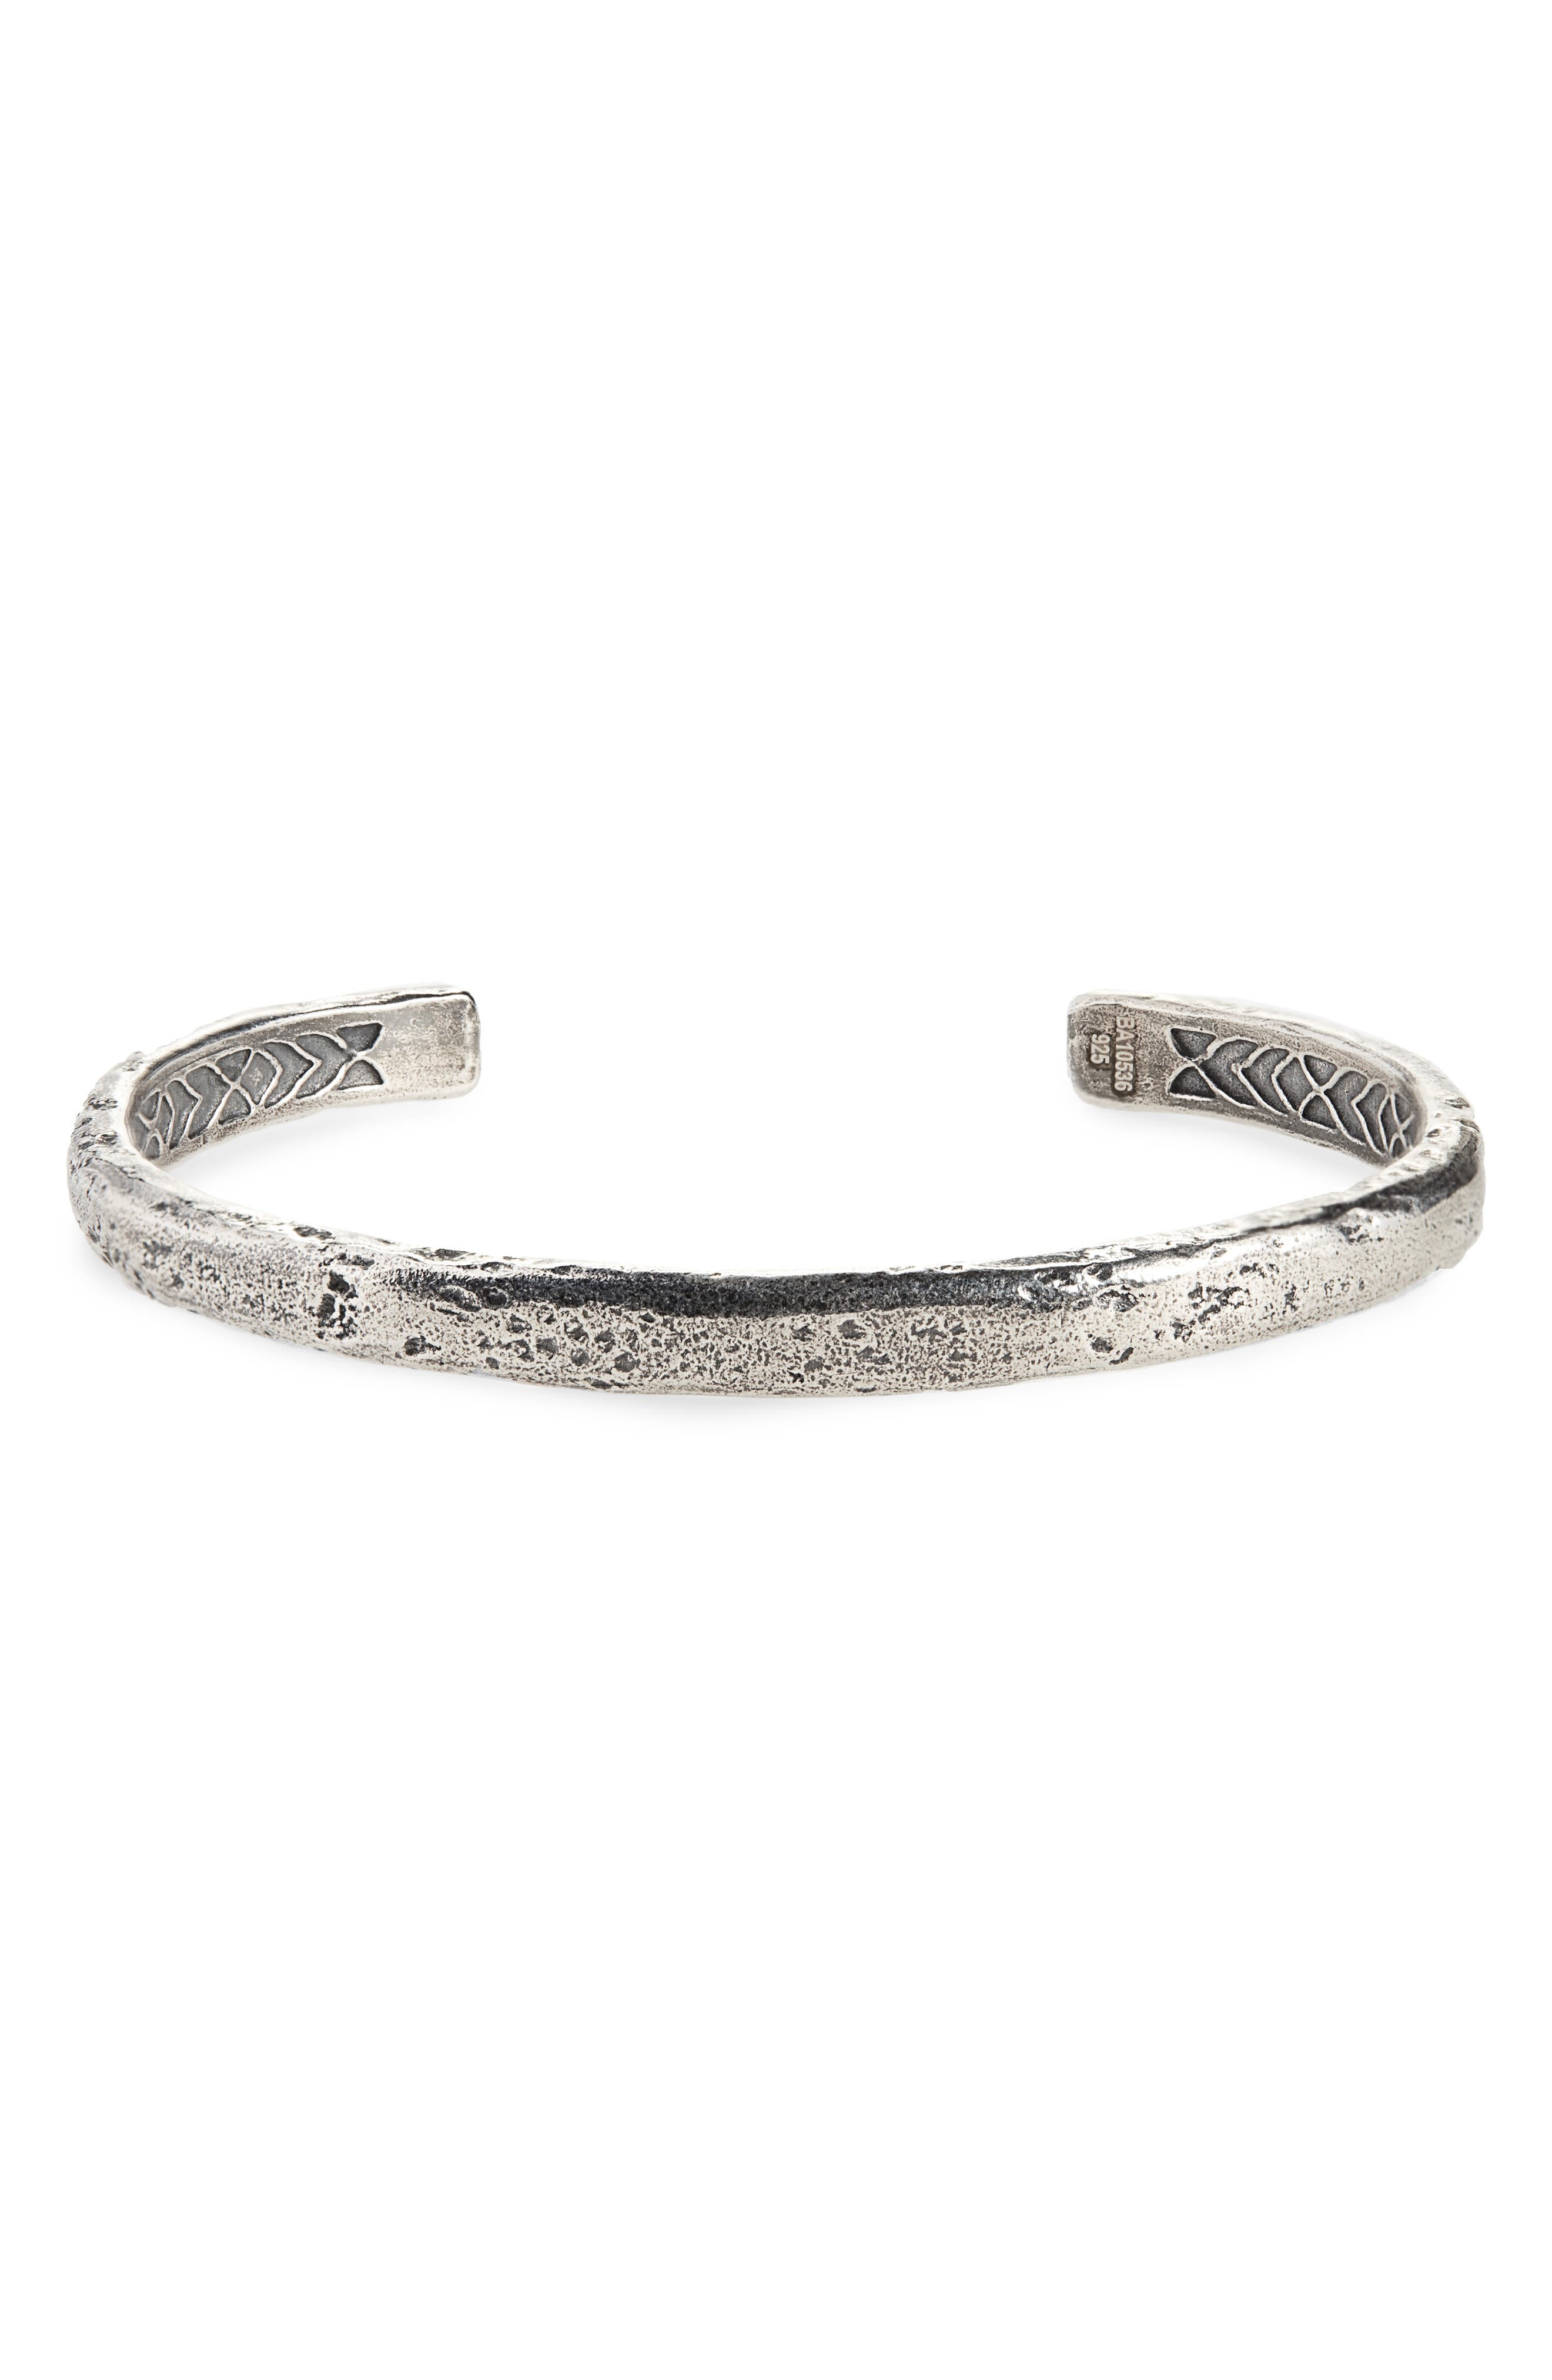 JOHN VARVATOS STAR USA,                             Silver Cuff Bracelet,                             Main thumbnail 1, color,                             METALLIC SILVER